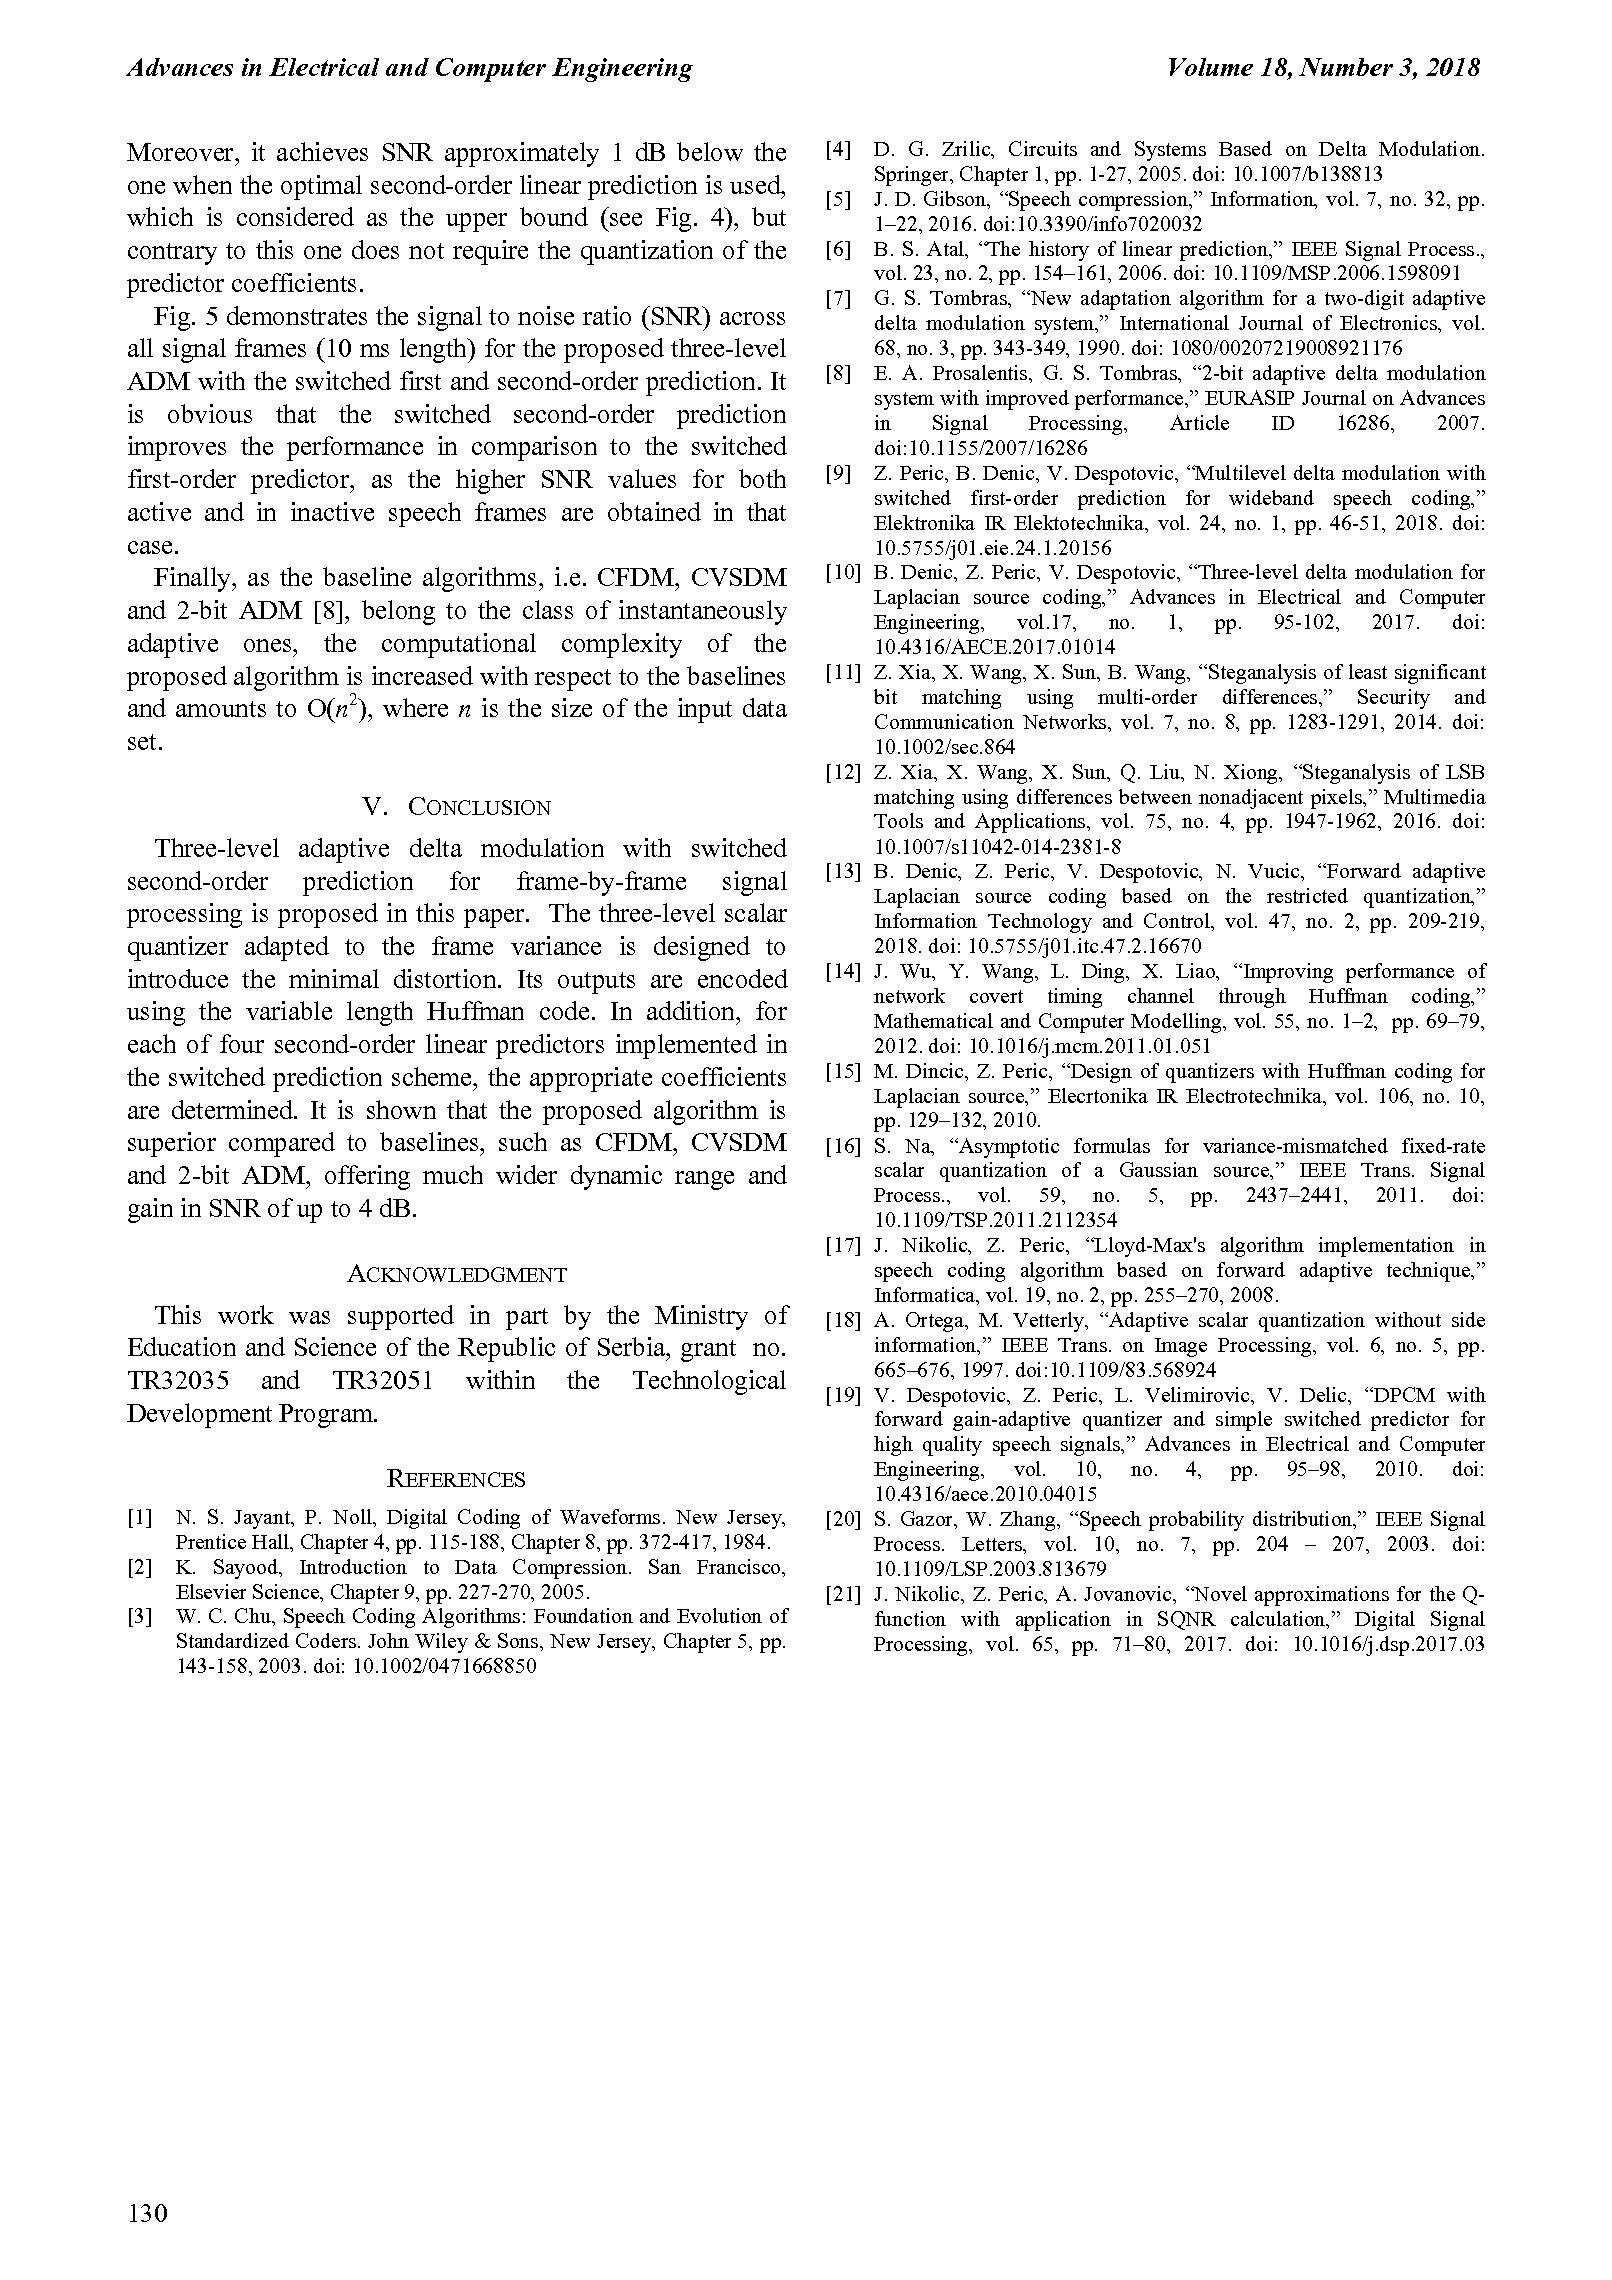 Three-Level Delta Modulation with Second-Order Prediction